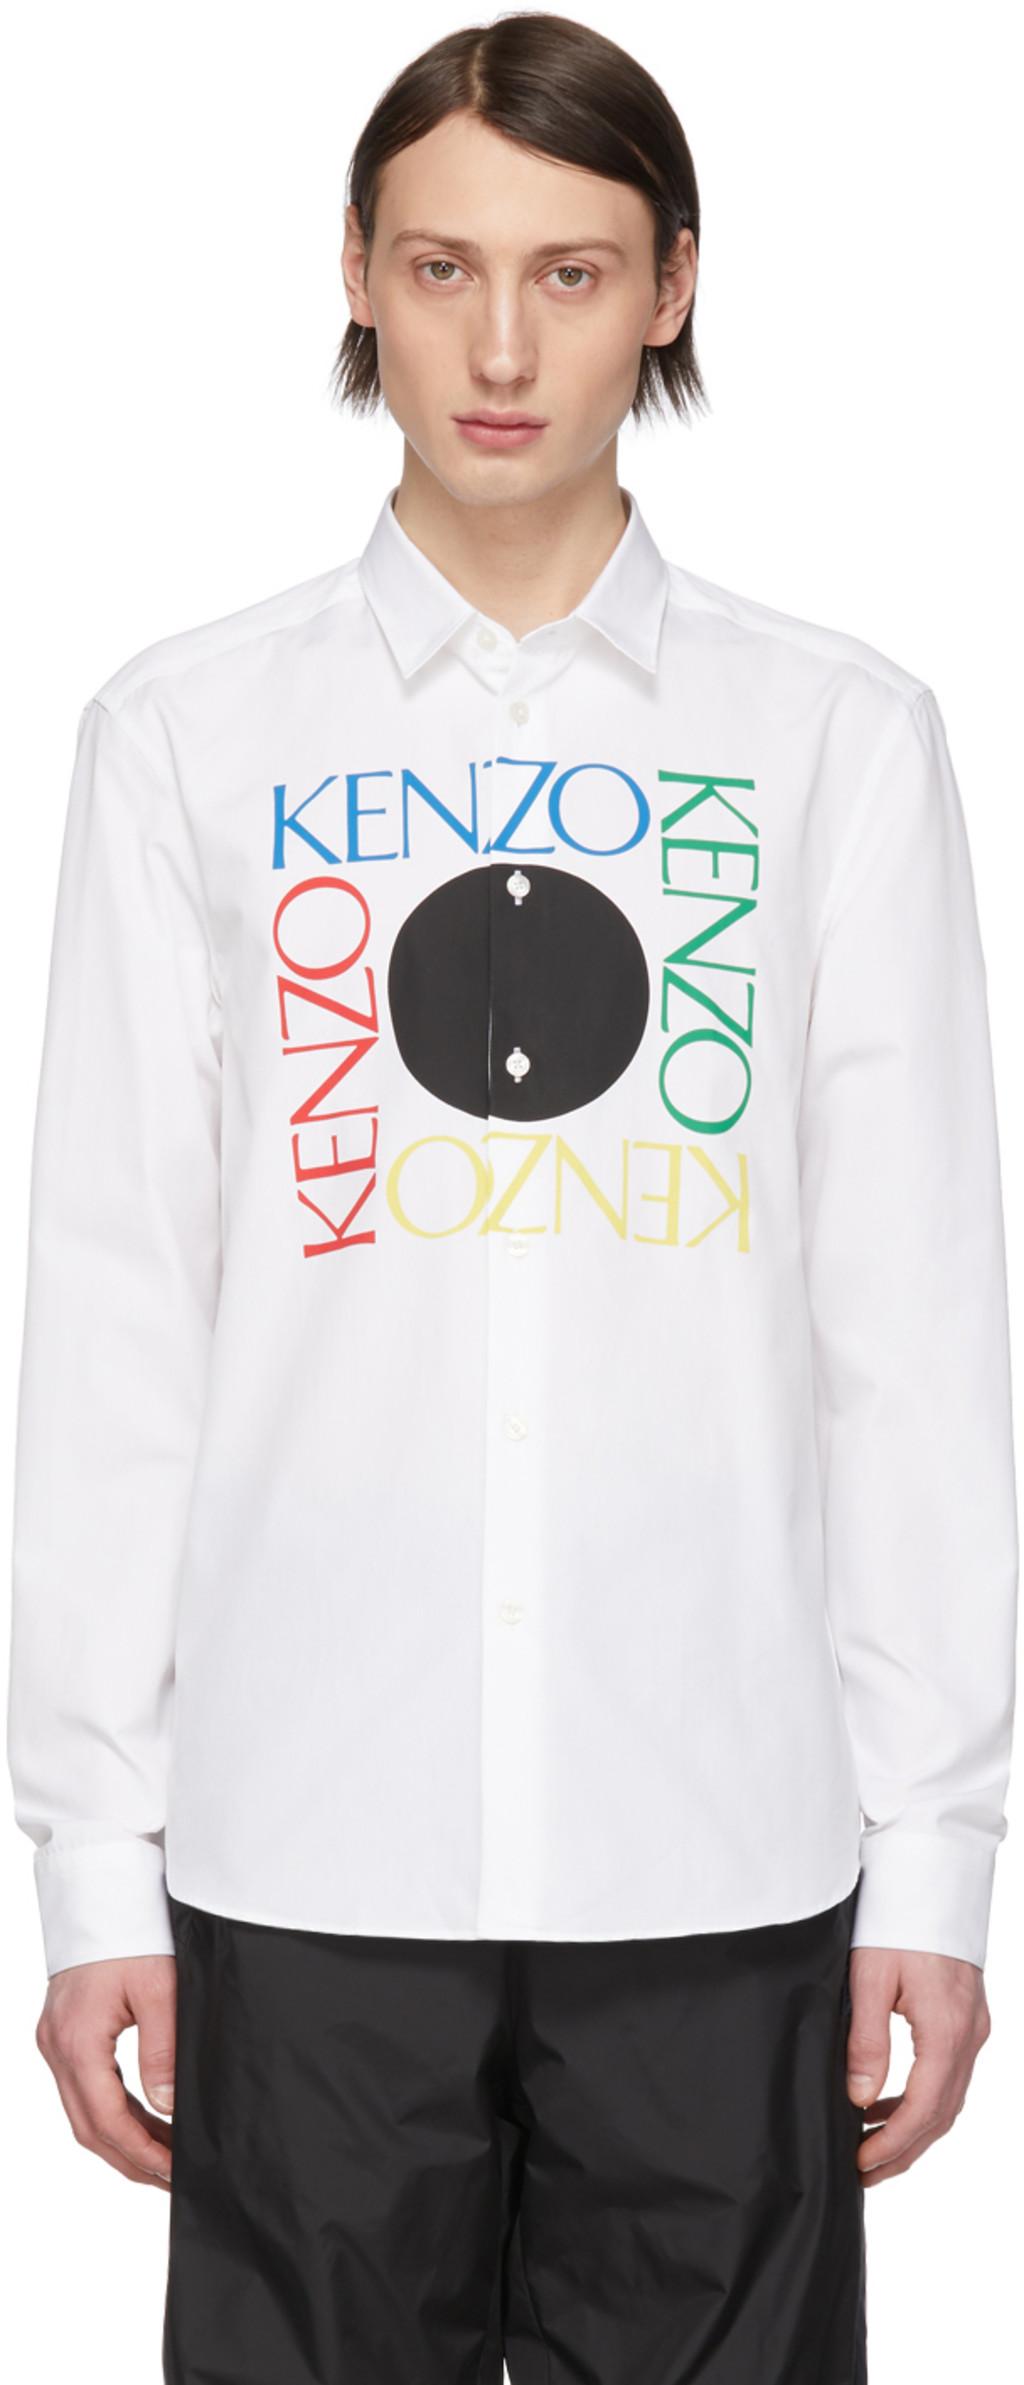 de78f725 Kenzo for Men SS19 Collection | SSENSE UK